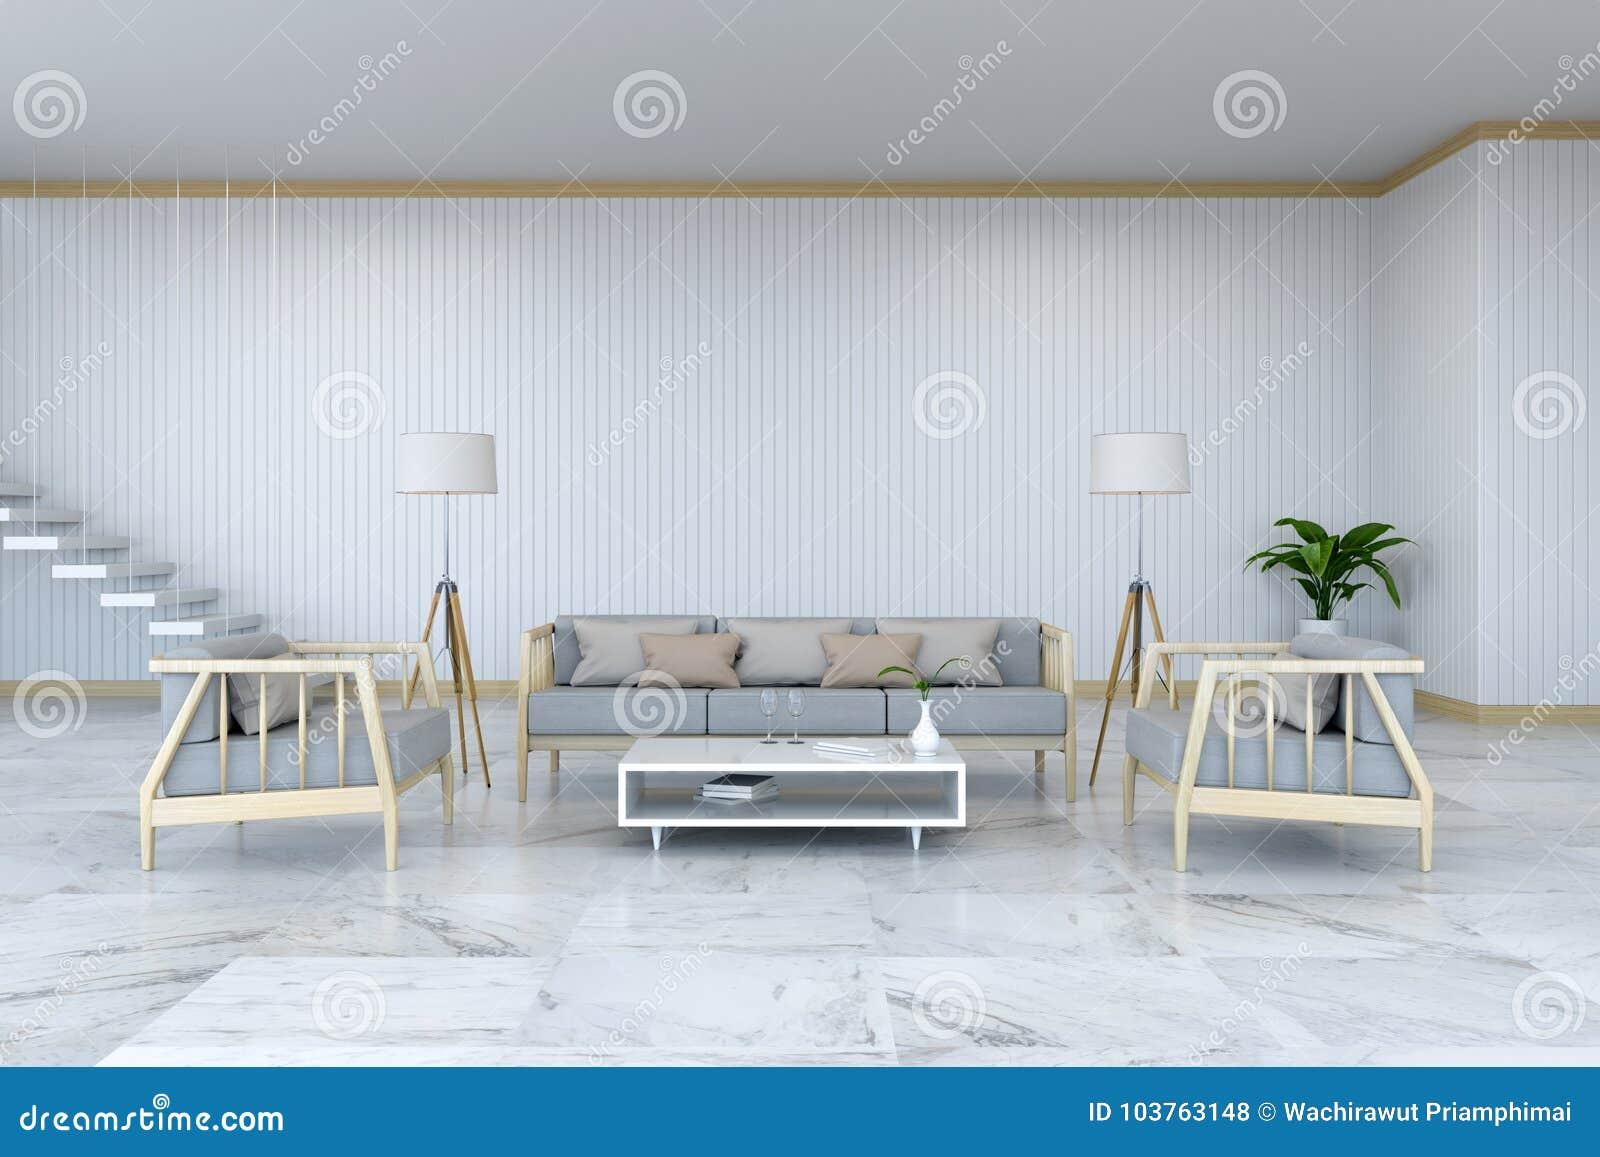 Minimalist Room Interior Design Wood Armchair And Sofa On Marble Floor And White Room 3d Render Stock Illustration Illustration Of Mockup Design 103763148